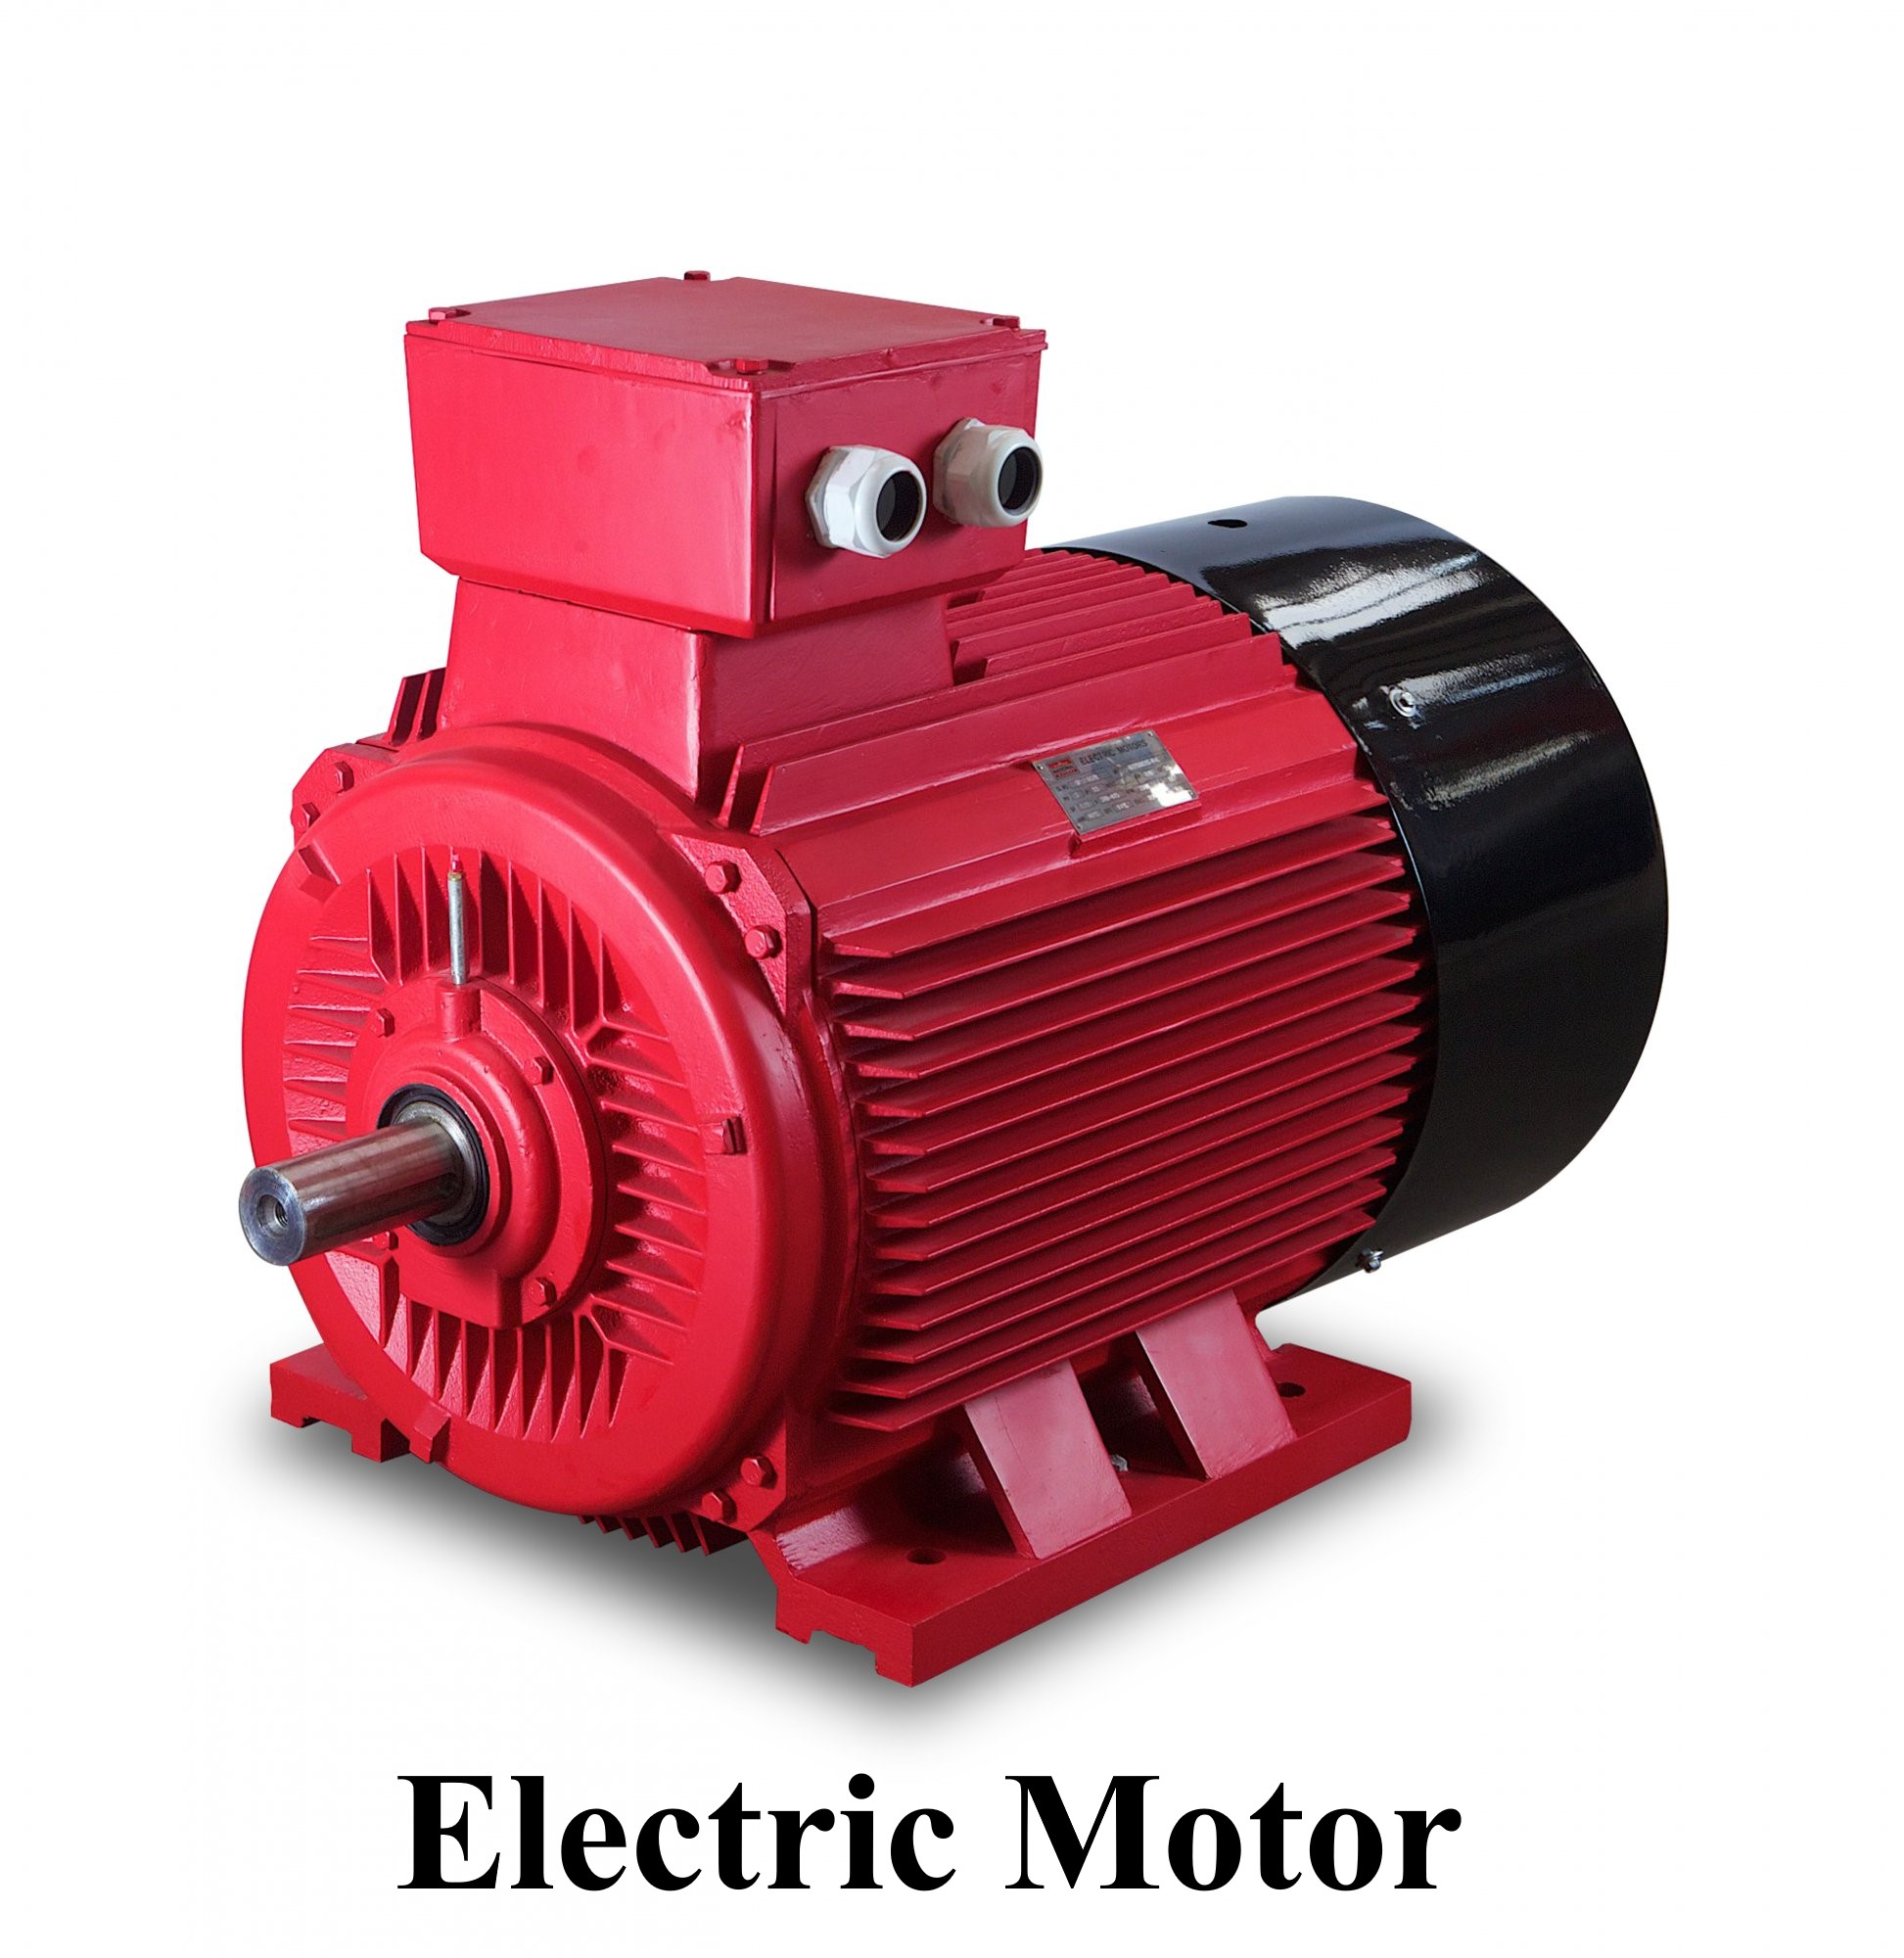 electric_motor_1447565336_wz530